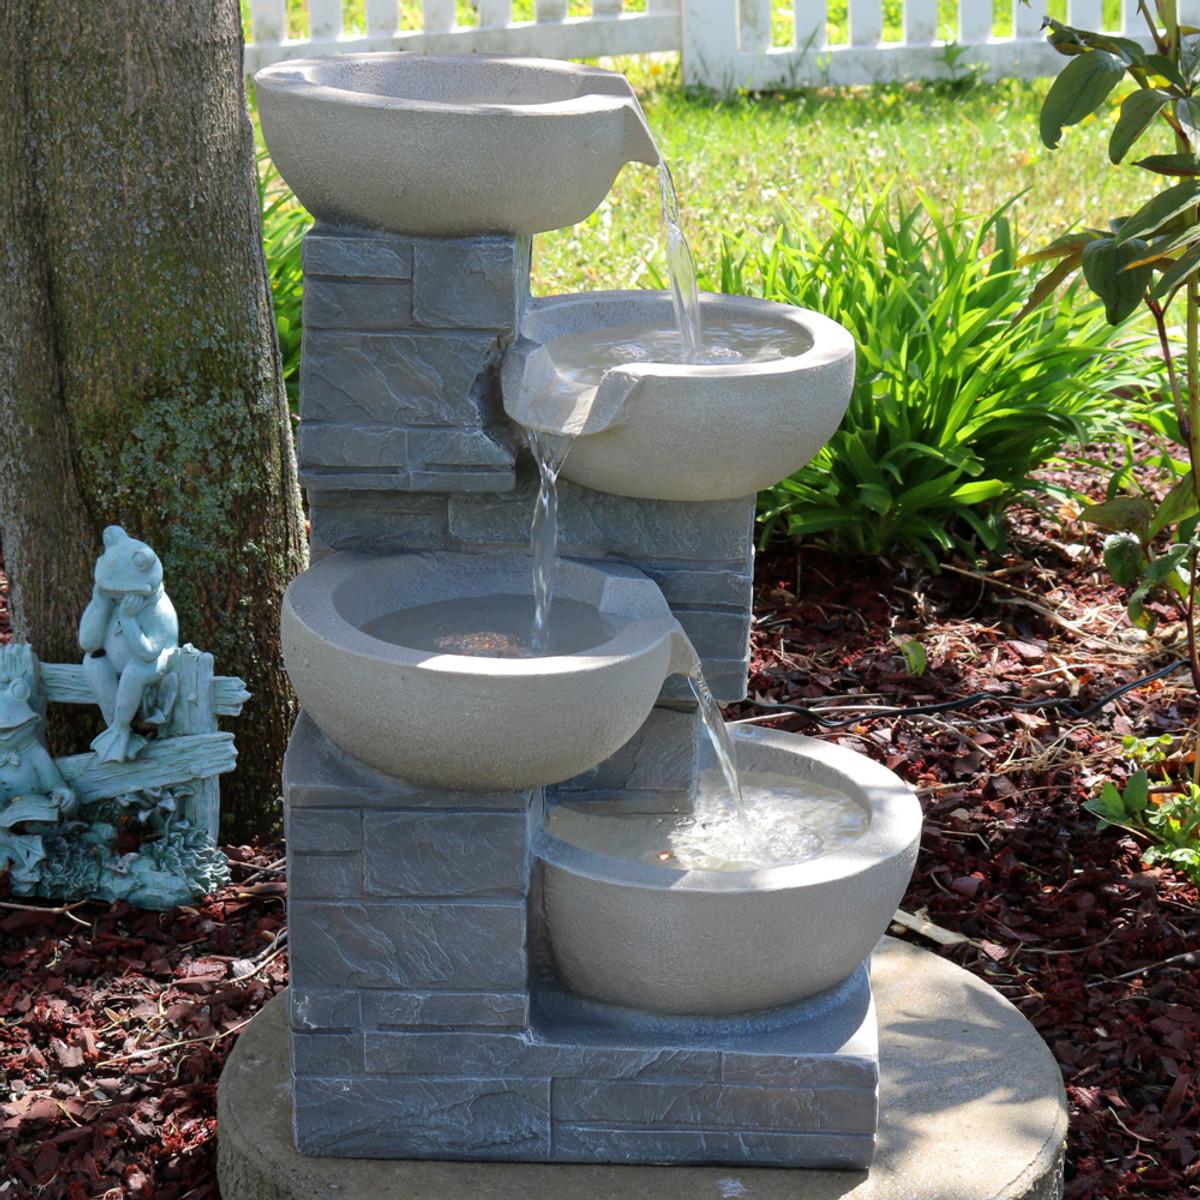 Sunnydaze 4 Tier Descending Stone Bowls Outdoor Water